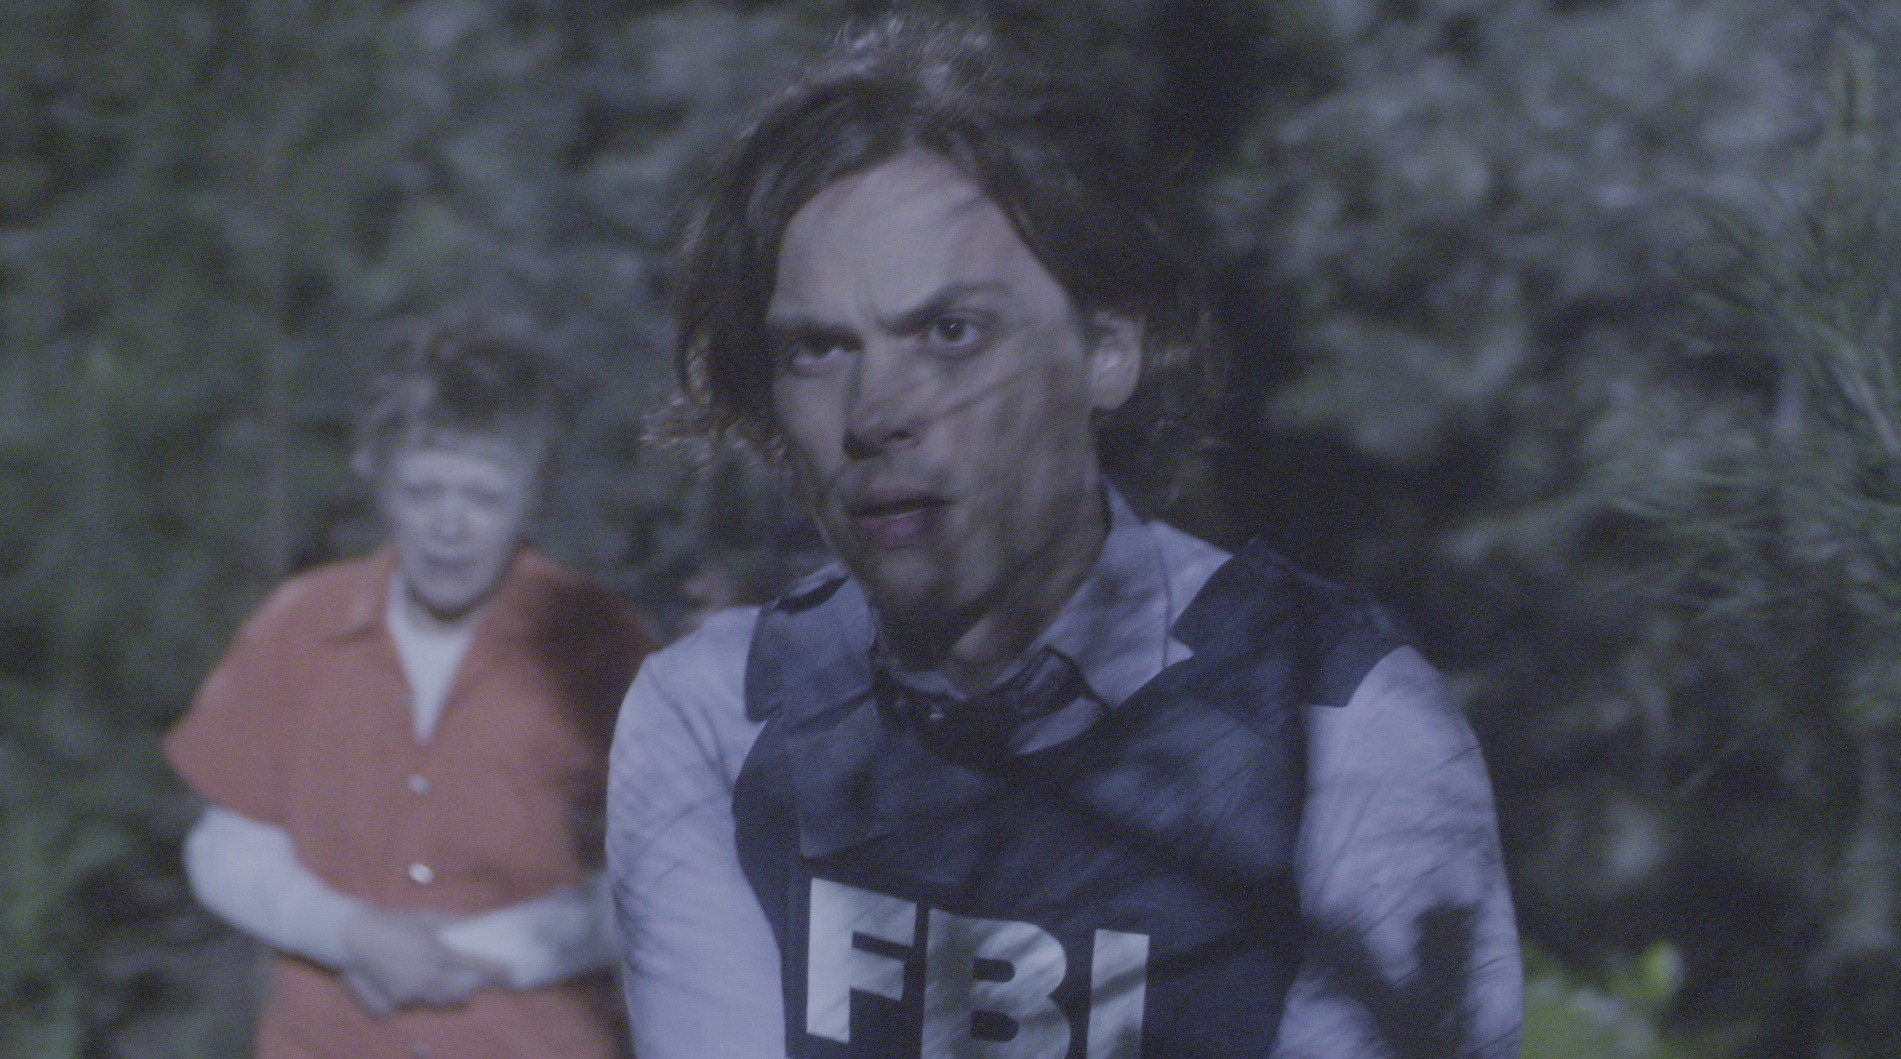 Reid goes into the field.